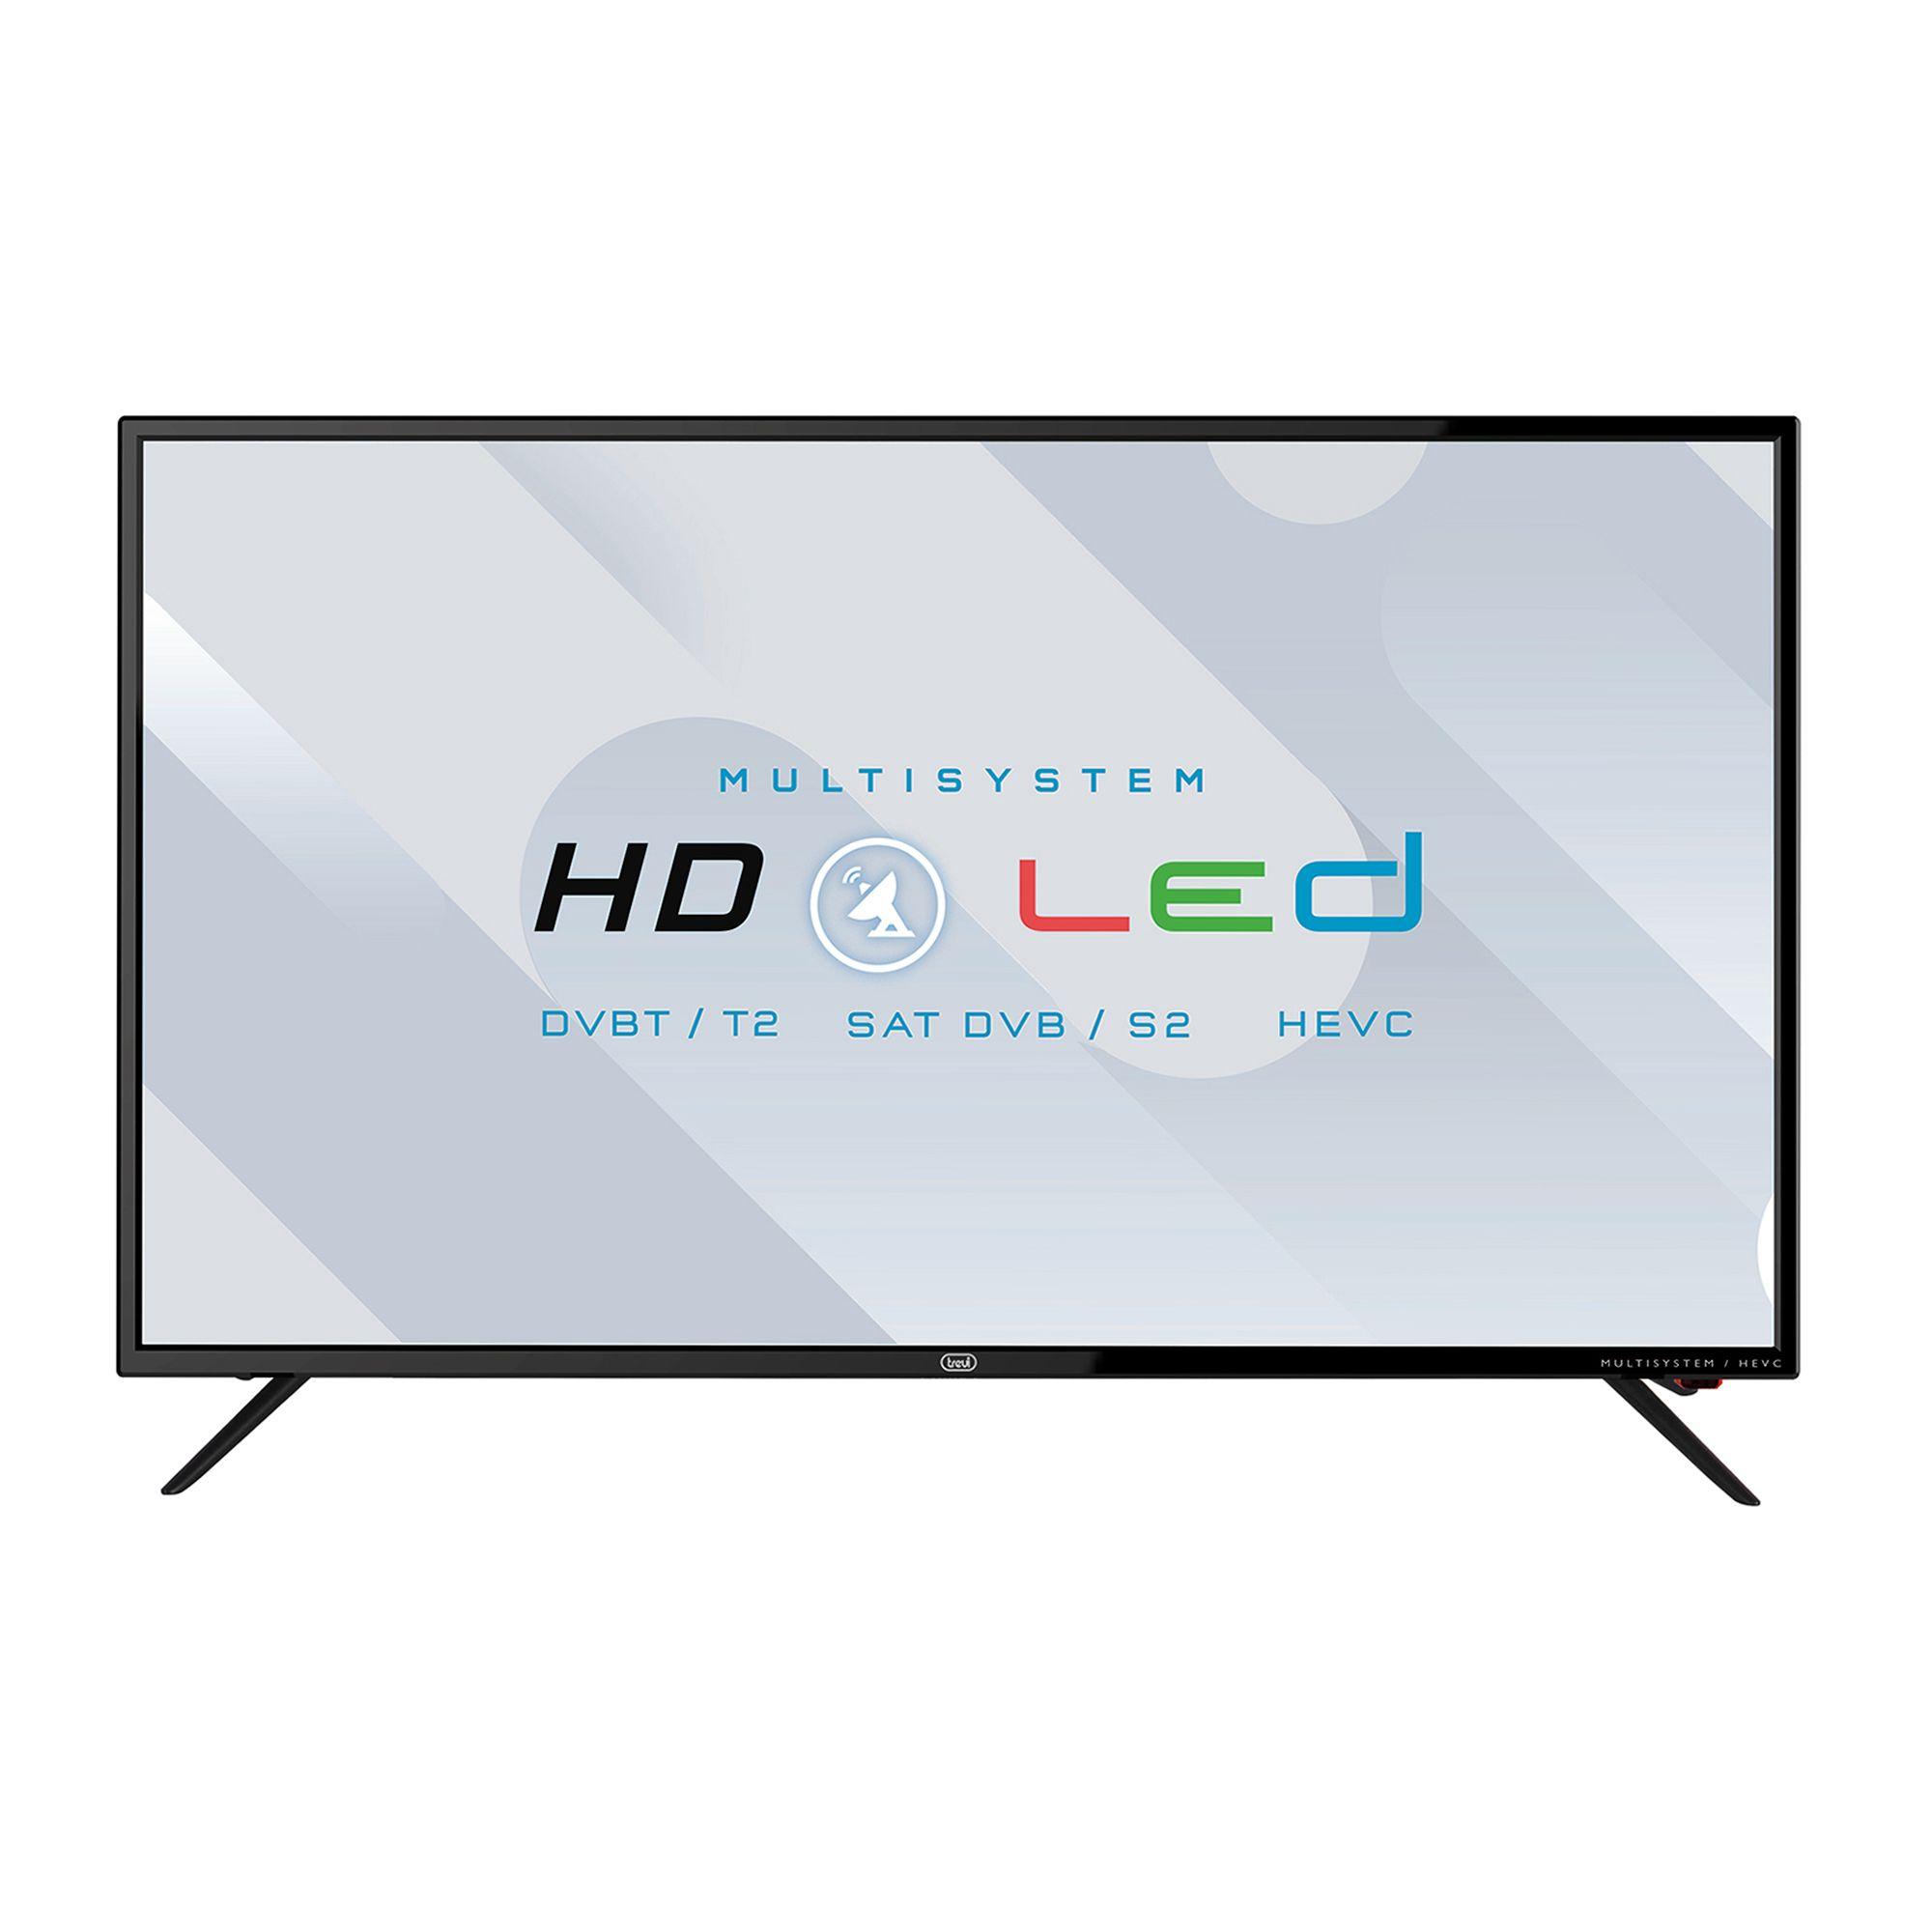 "Image of LTV 3206 TV LED 32"""" HD Ready con DVB-T2 e DVB-S2"